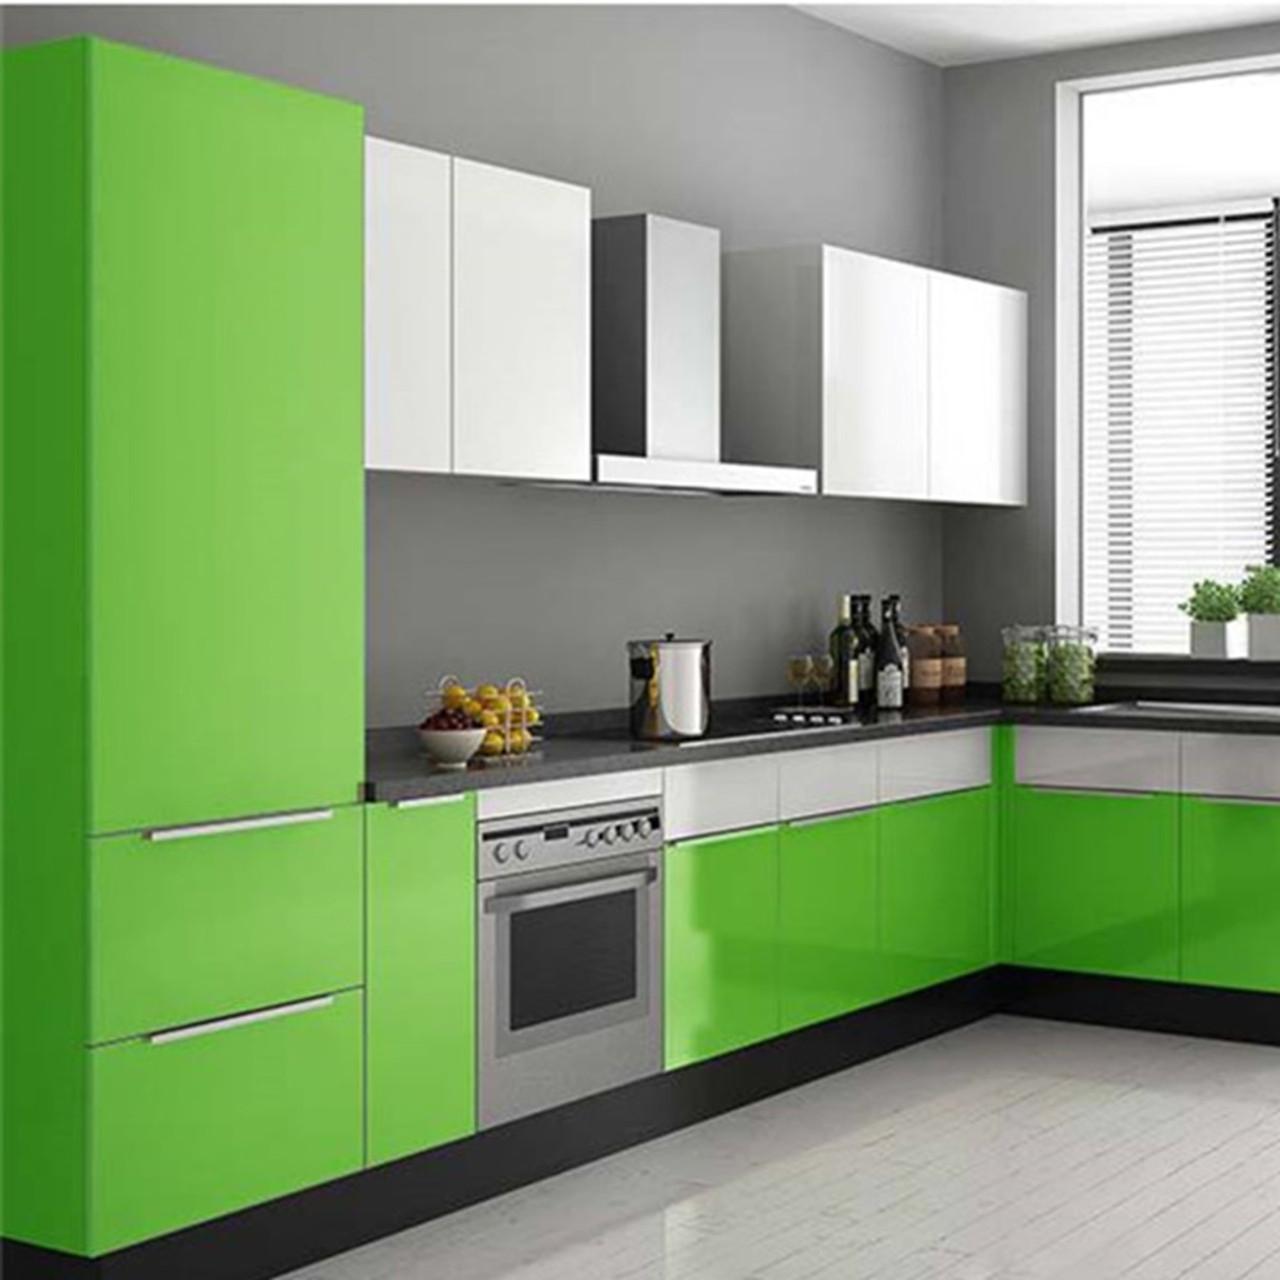 Waterproof Pvc Vinyl Solid Color Green Self Adhesive Wallpaper Kitchen Wardrobe Cabinet Furniture Renovation Door Wall Stickers Onshopdeals Com